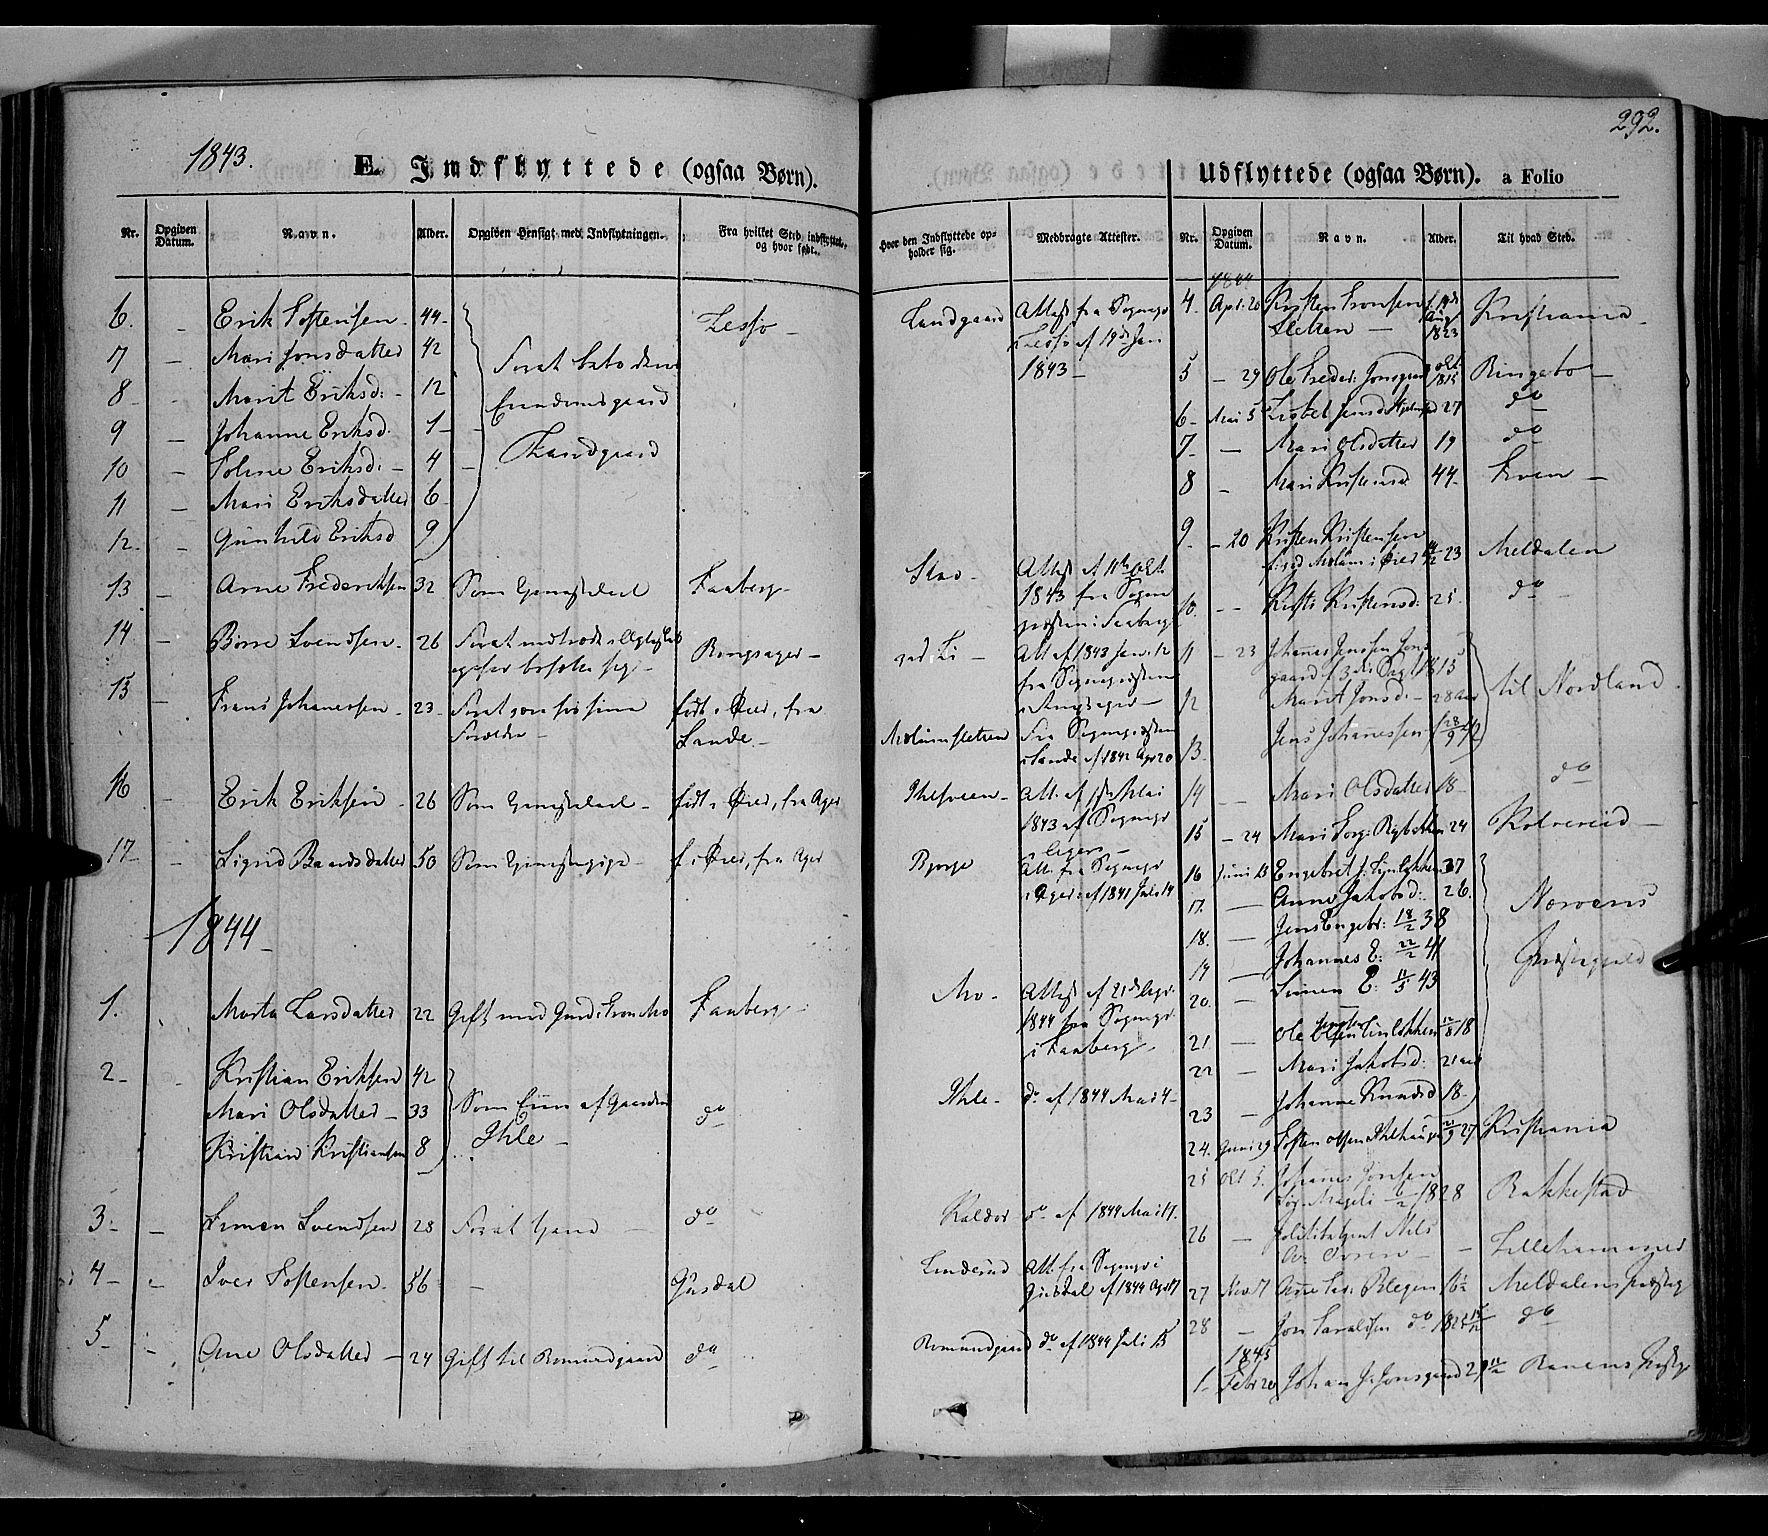 SAH, Øyer prestekontor, Ministerialbok nr. 5, 1842-1857, s. 292